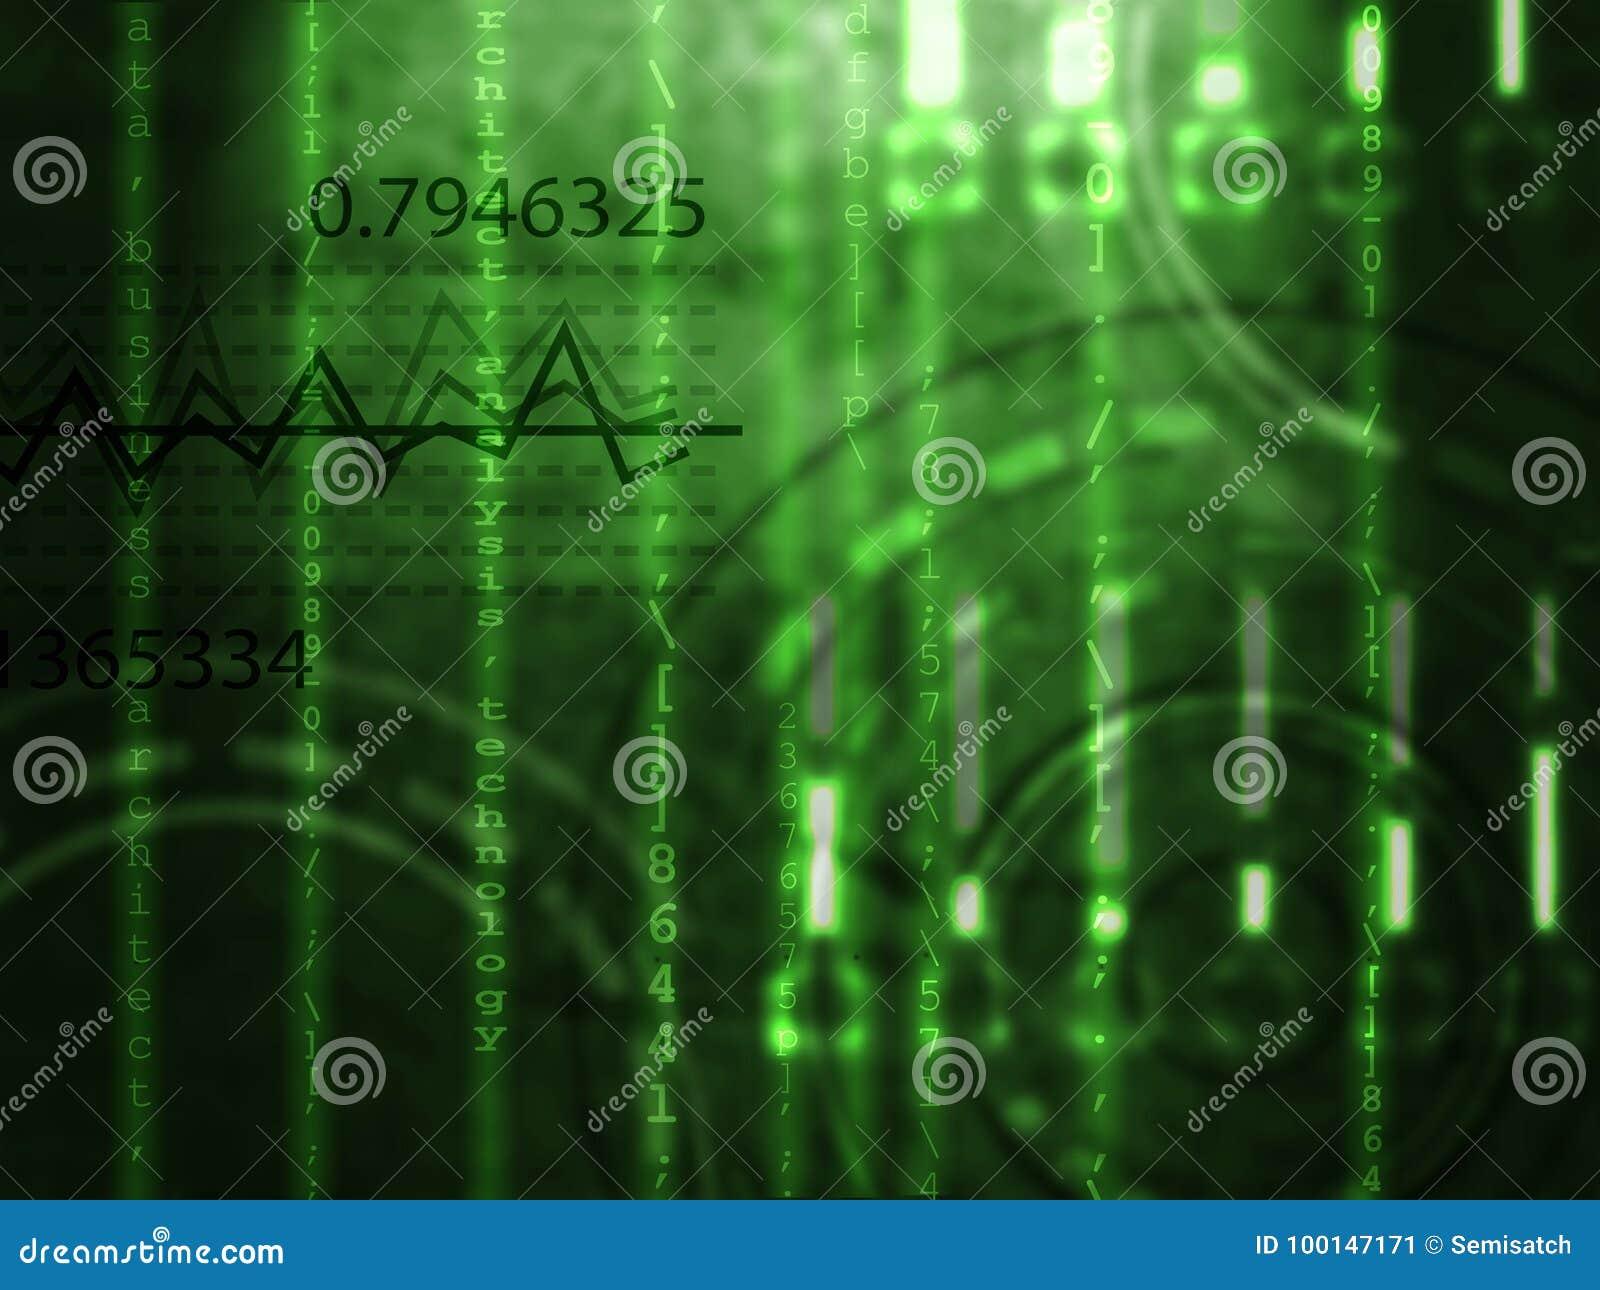 Matrix Style Numbers Background Stock Illustration - Illustration of ...